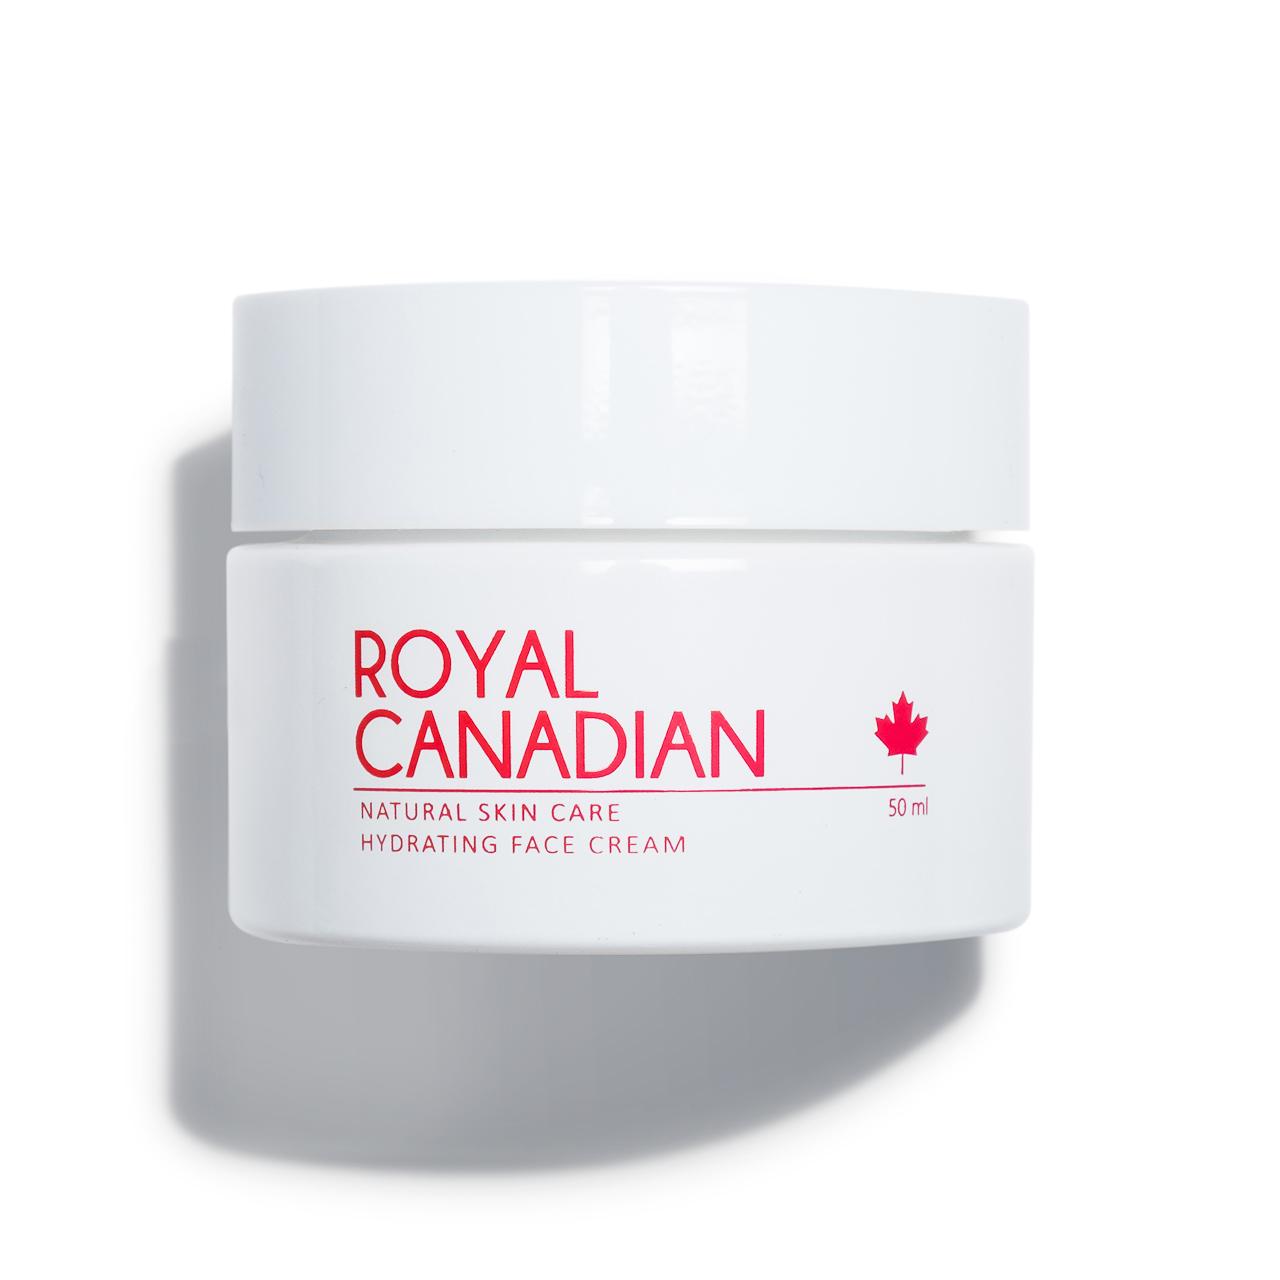 royal_canadian_1a.jpg